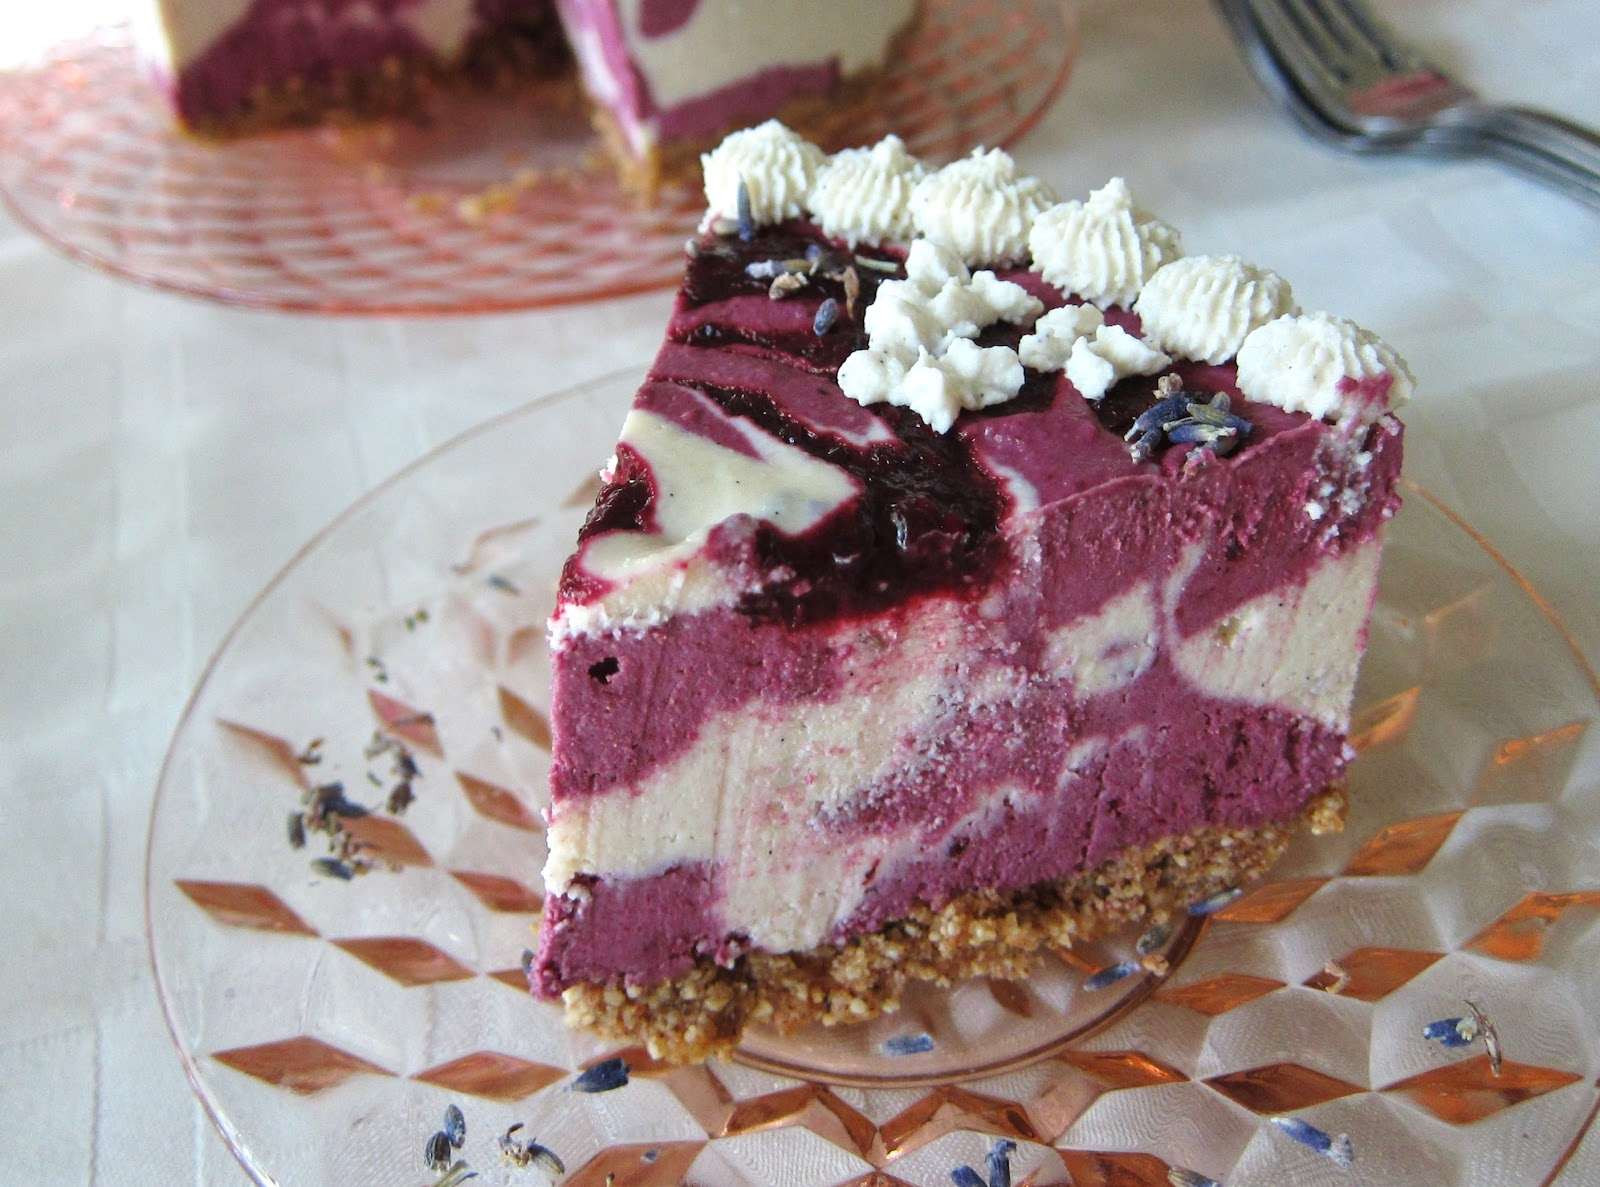 Fragrant Vanilla Raw Blackberry Lemon Lavender Cheesecake